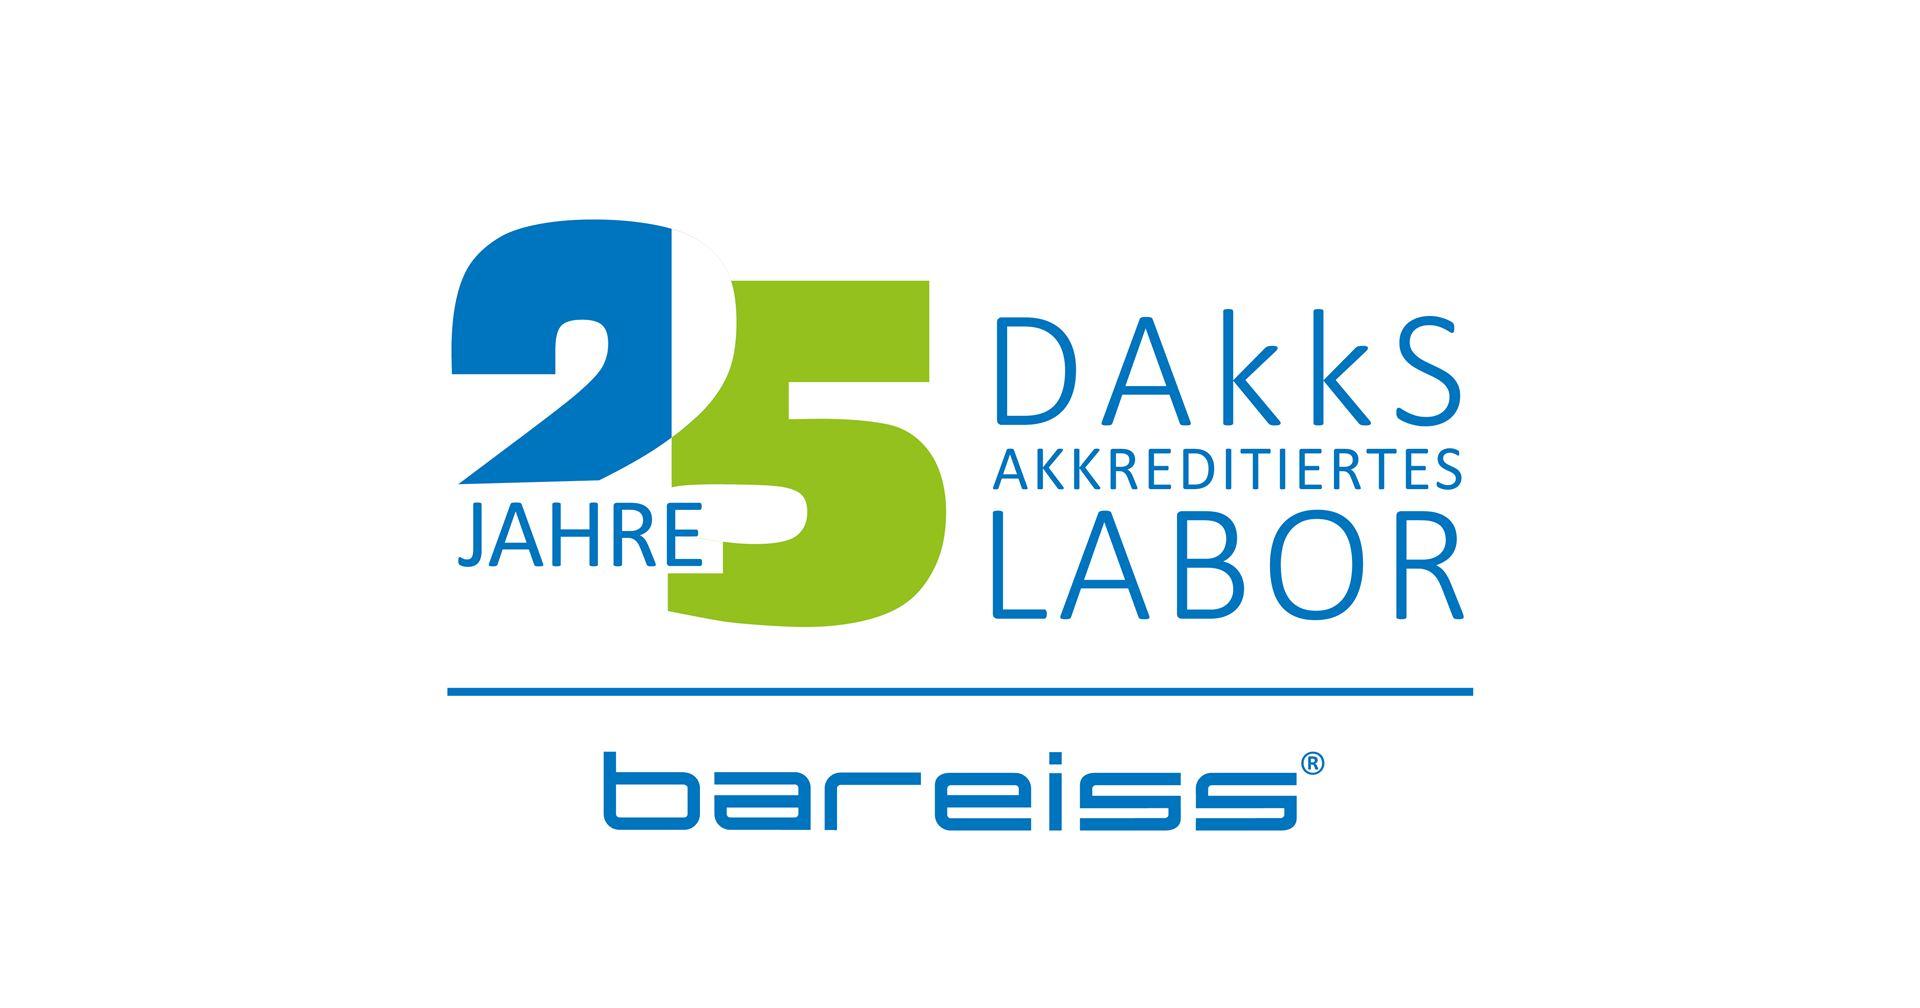 25 years DAkkS accredited laboratory